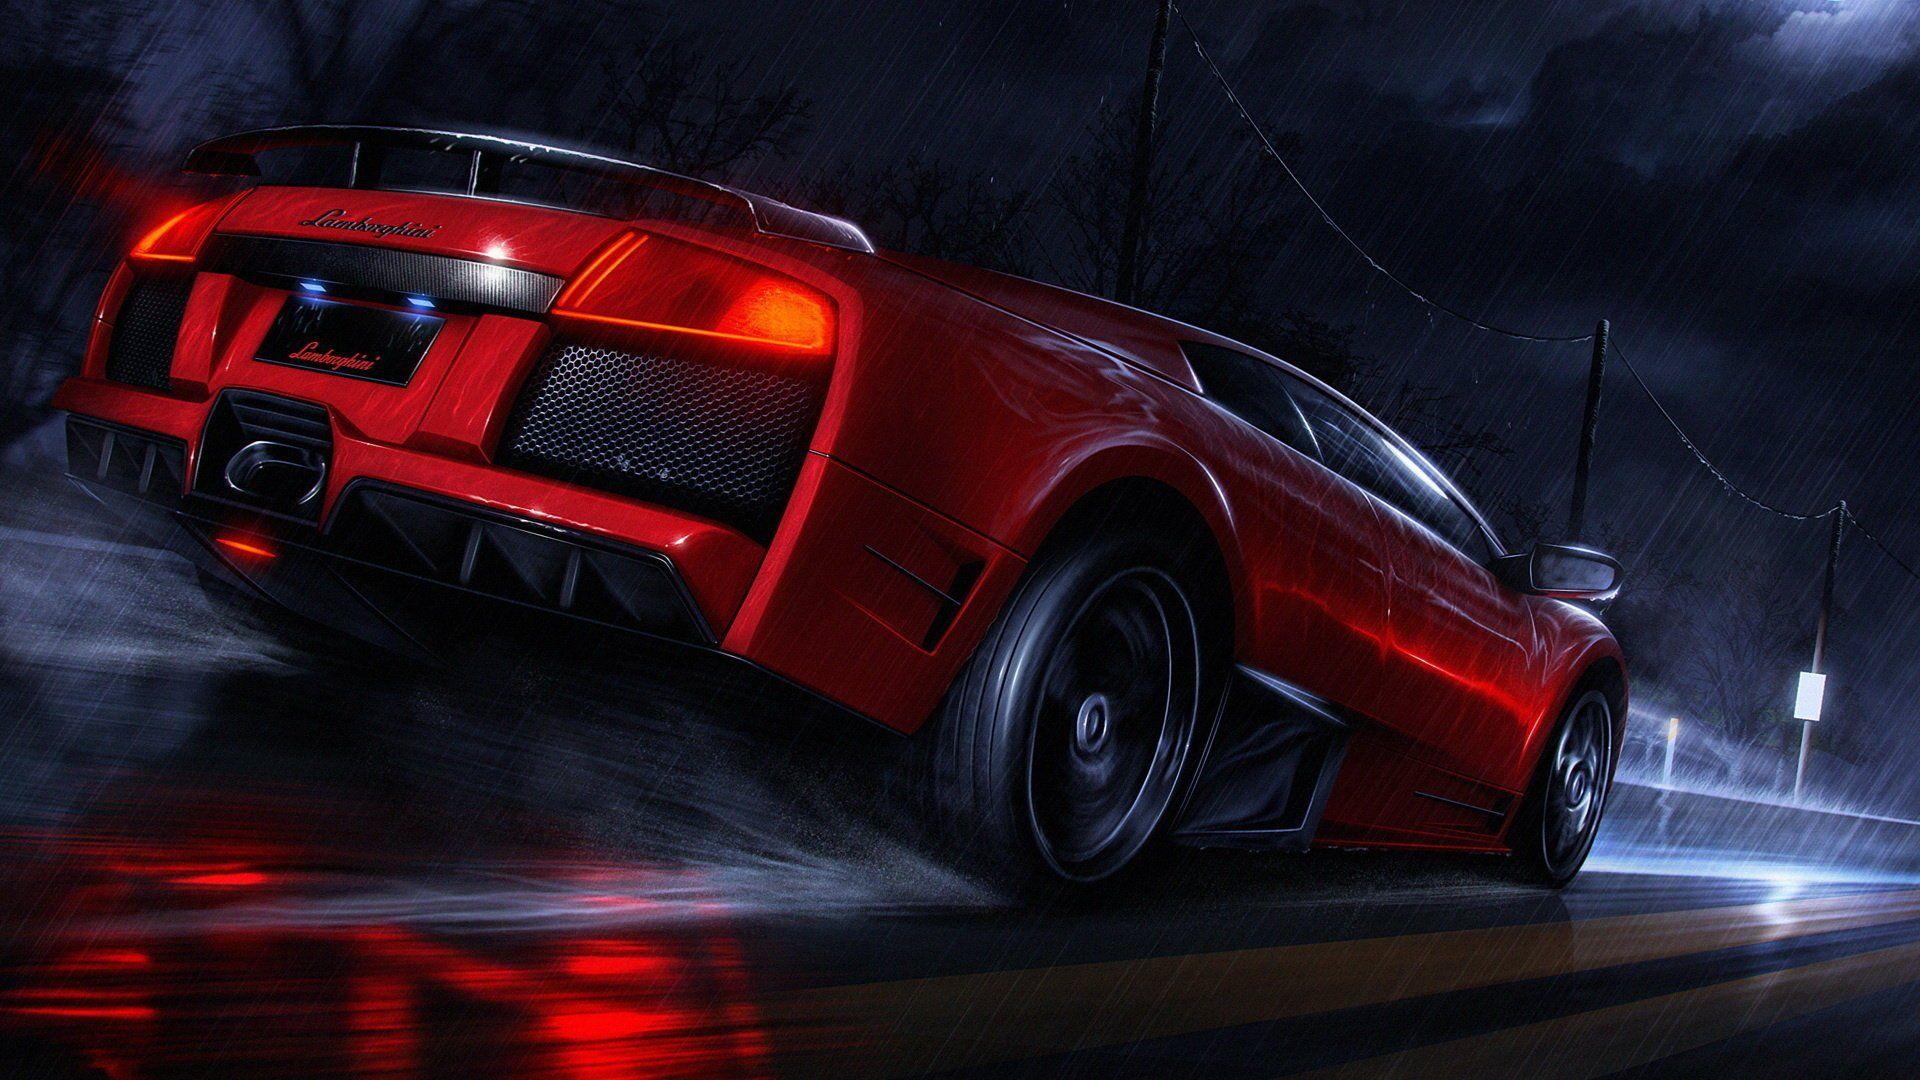 Car Night Art Background For Desktop Road